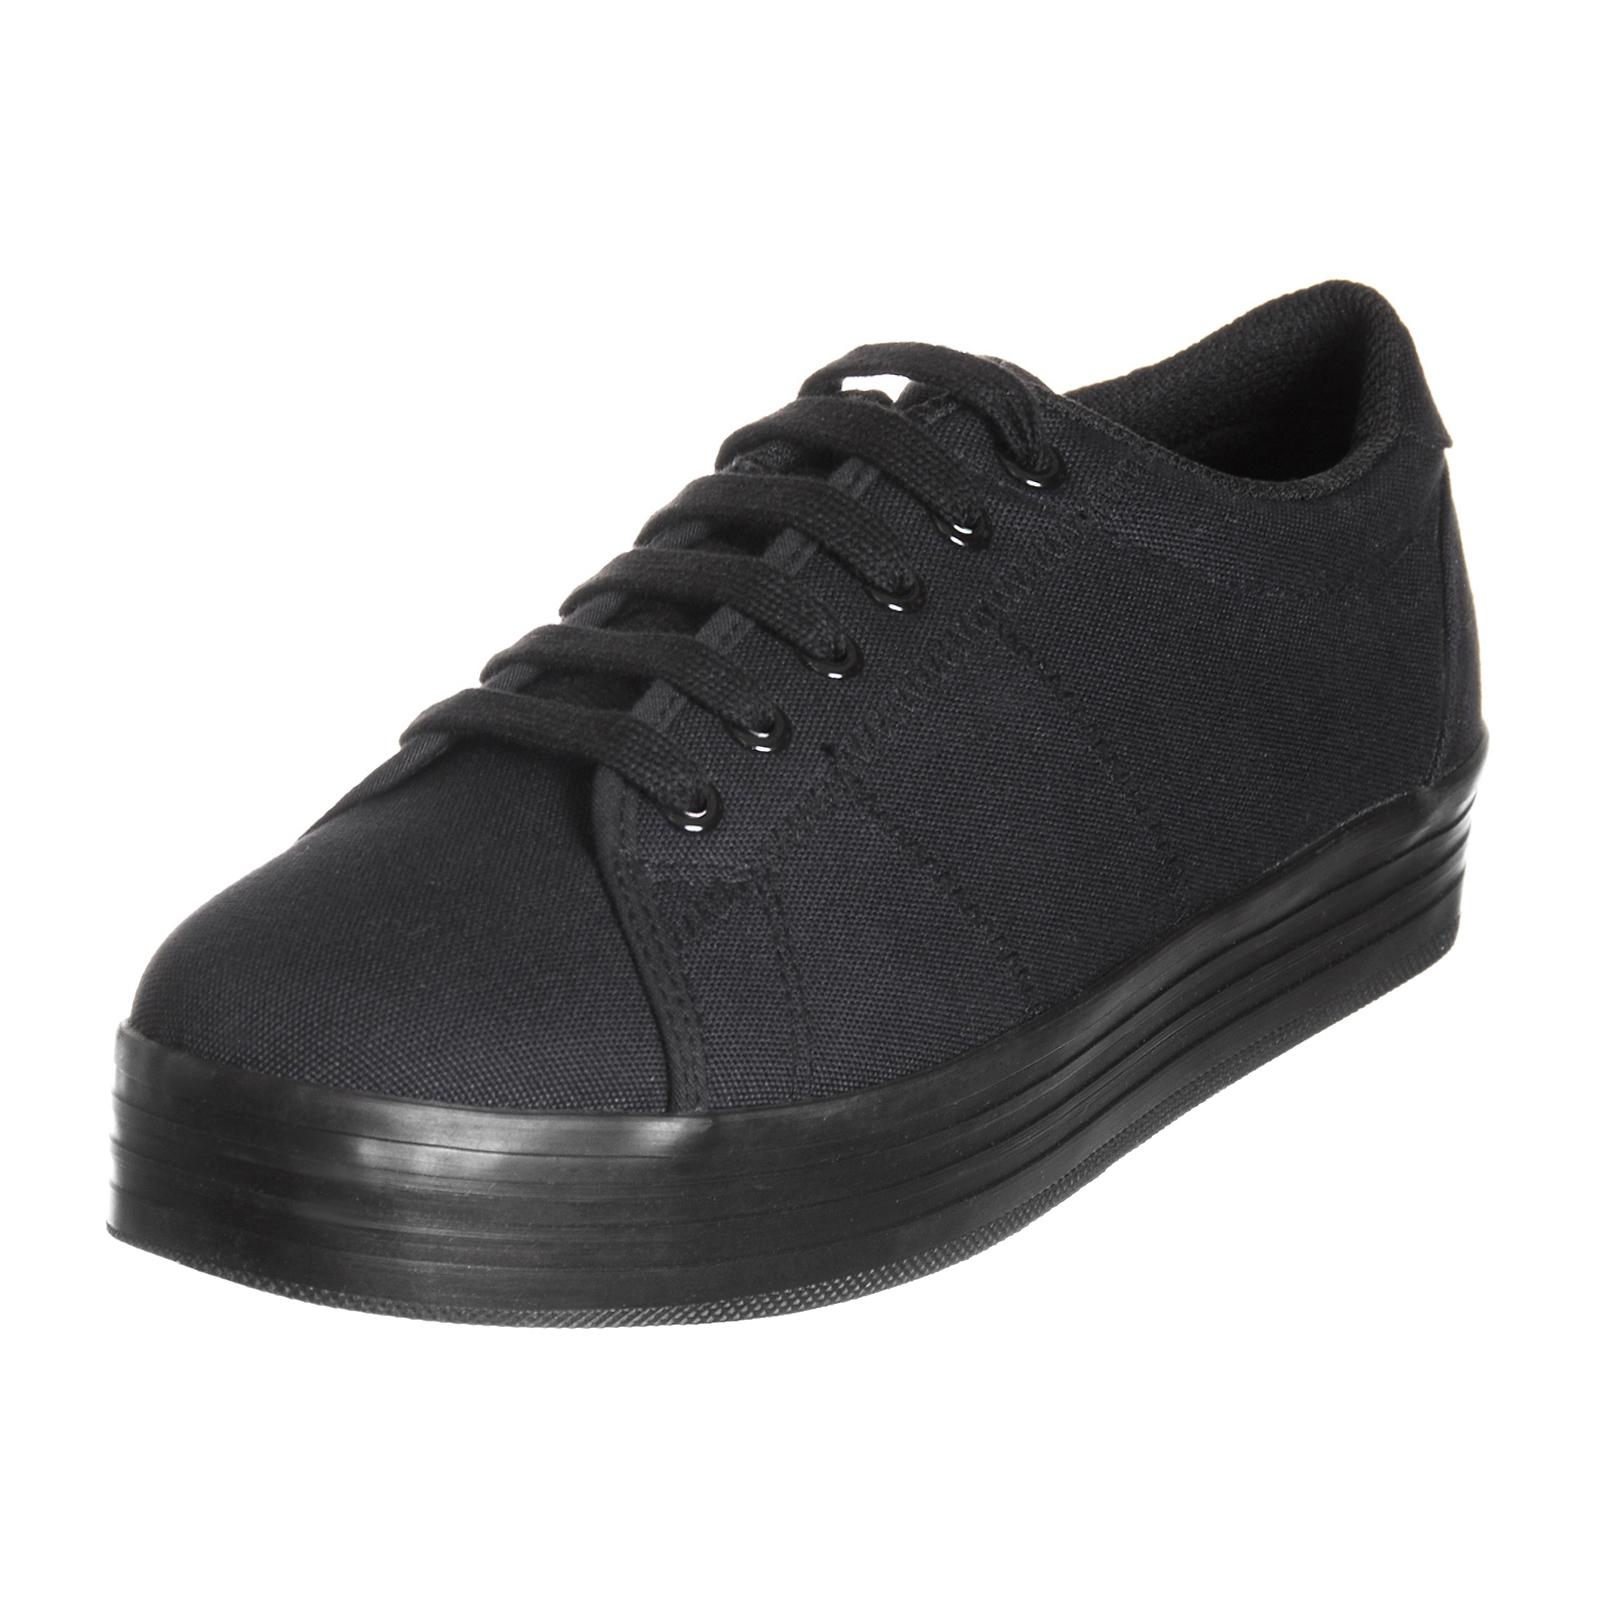 Jeffrey Campbell Sneakers Uomo Zomg Canvas Black Black